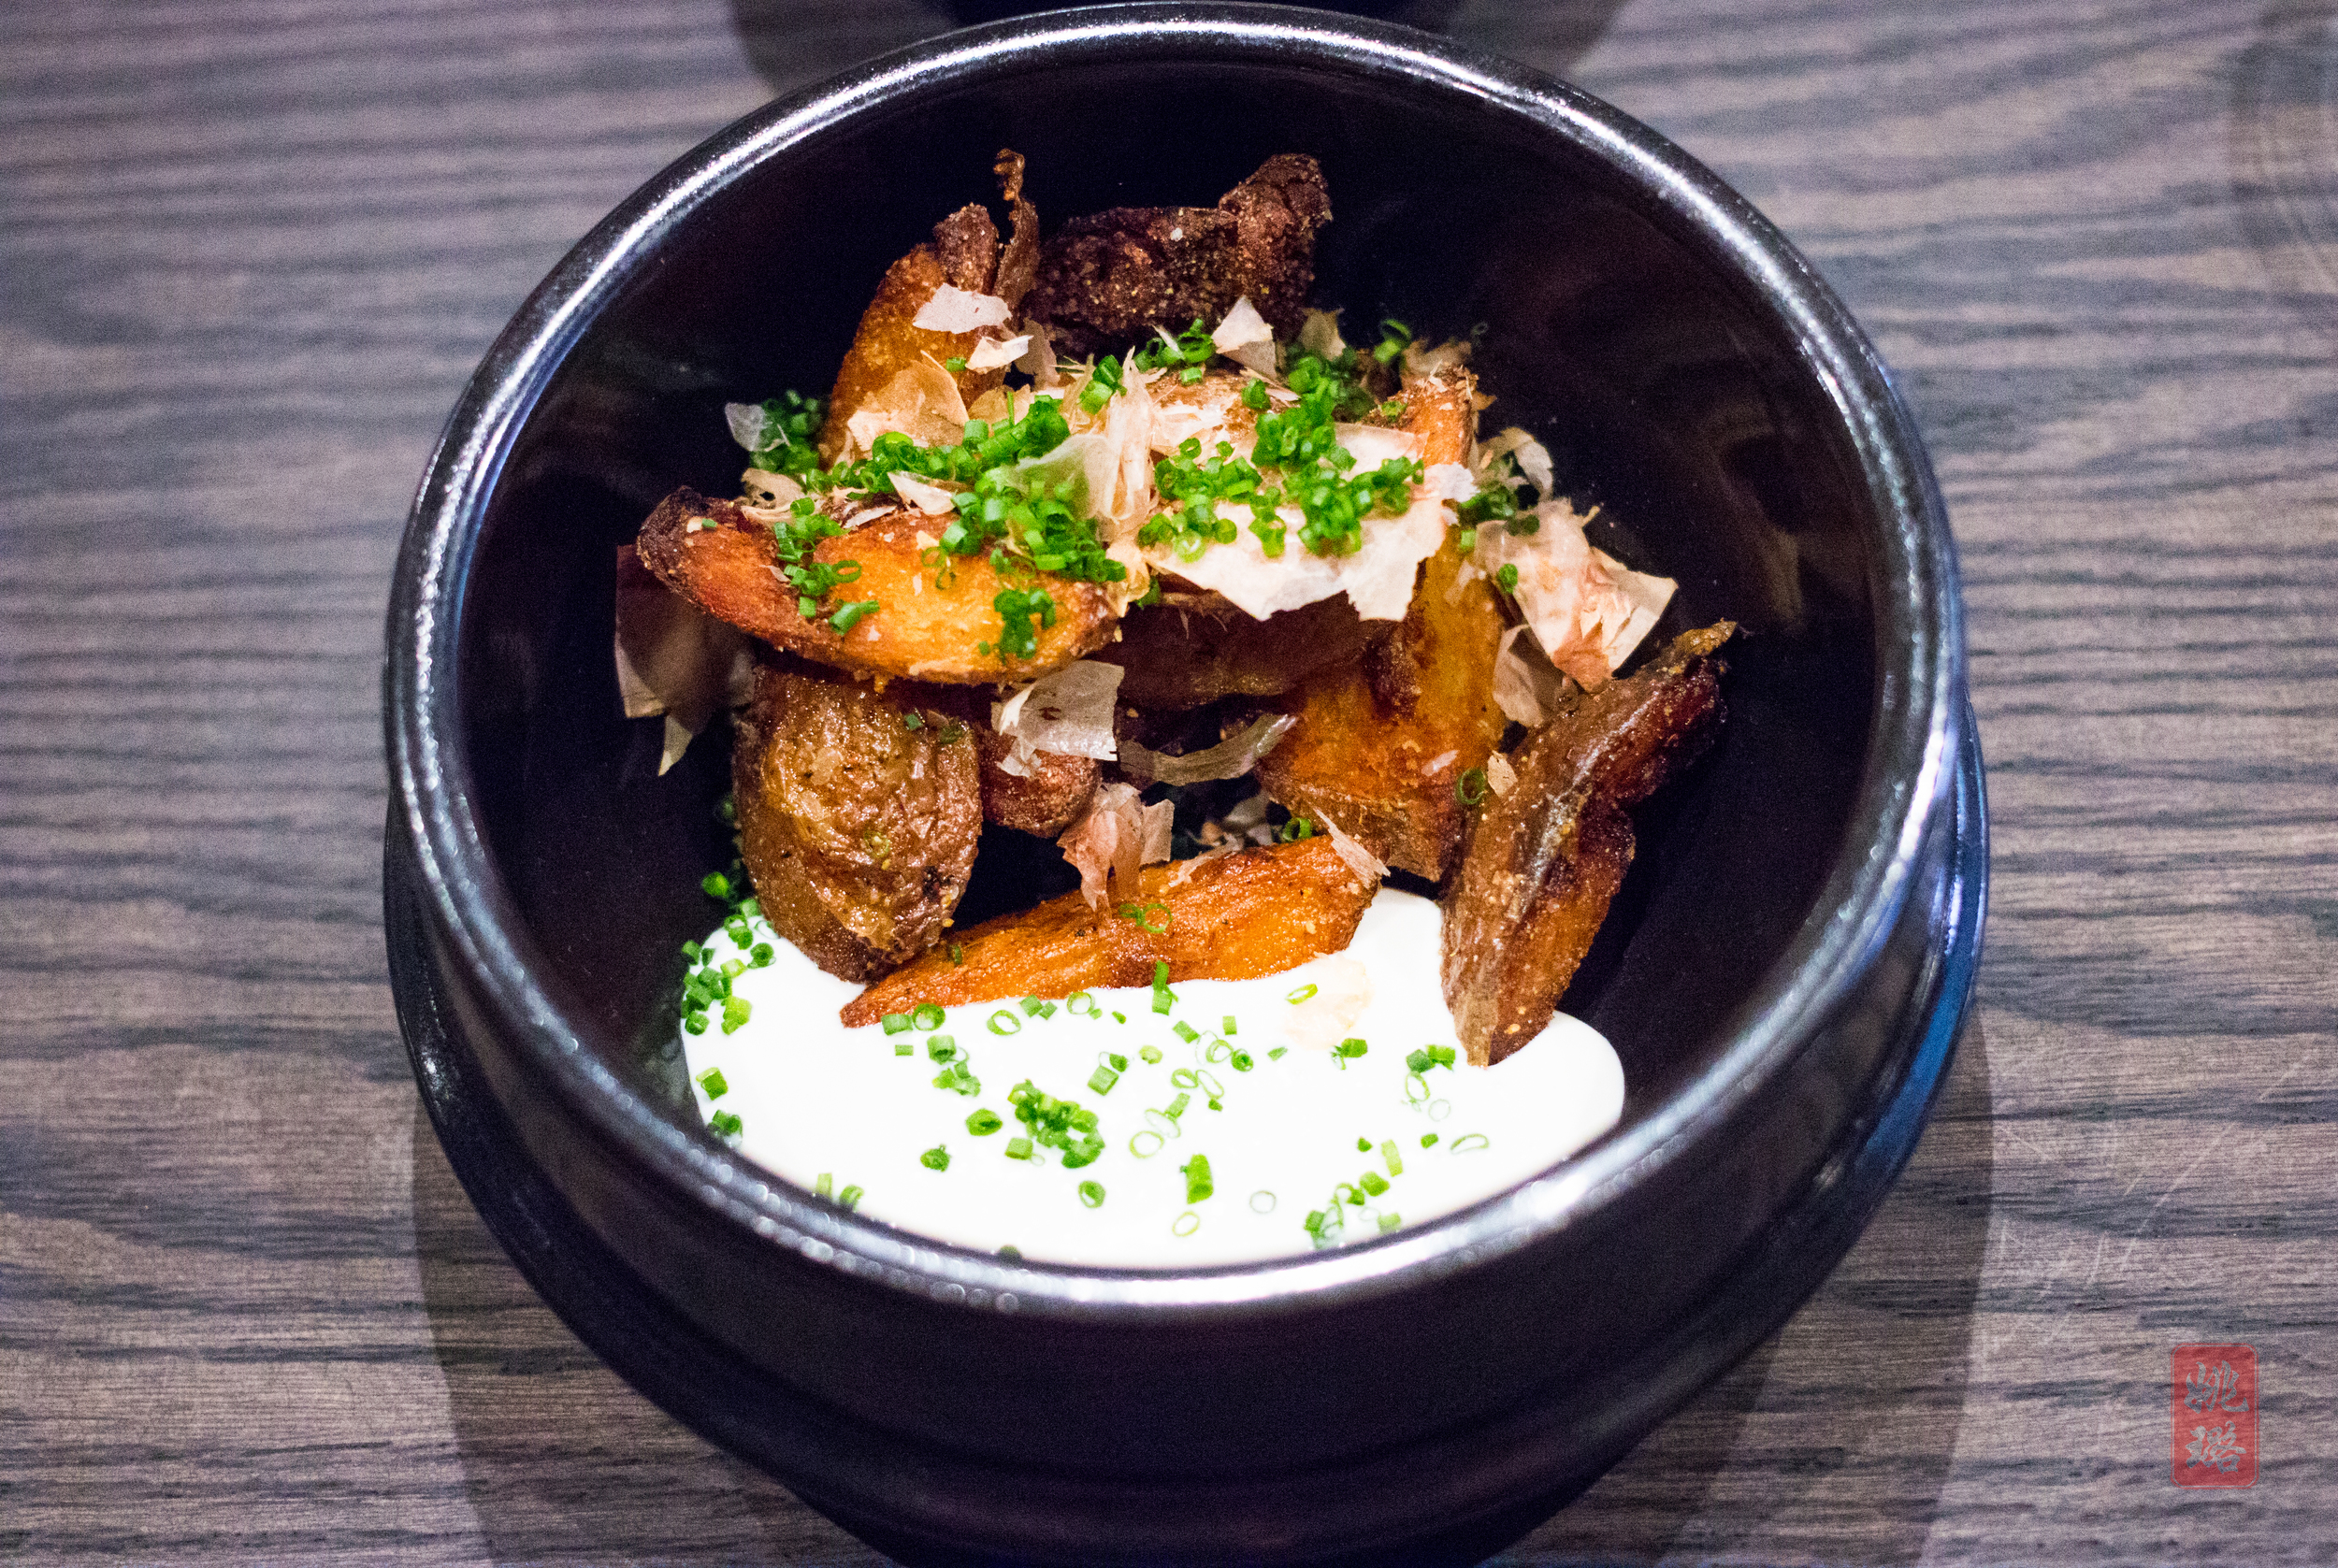 Yukon fries - soy dusted, bonito flakes, rice vinegar, tofu mayo